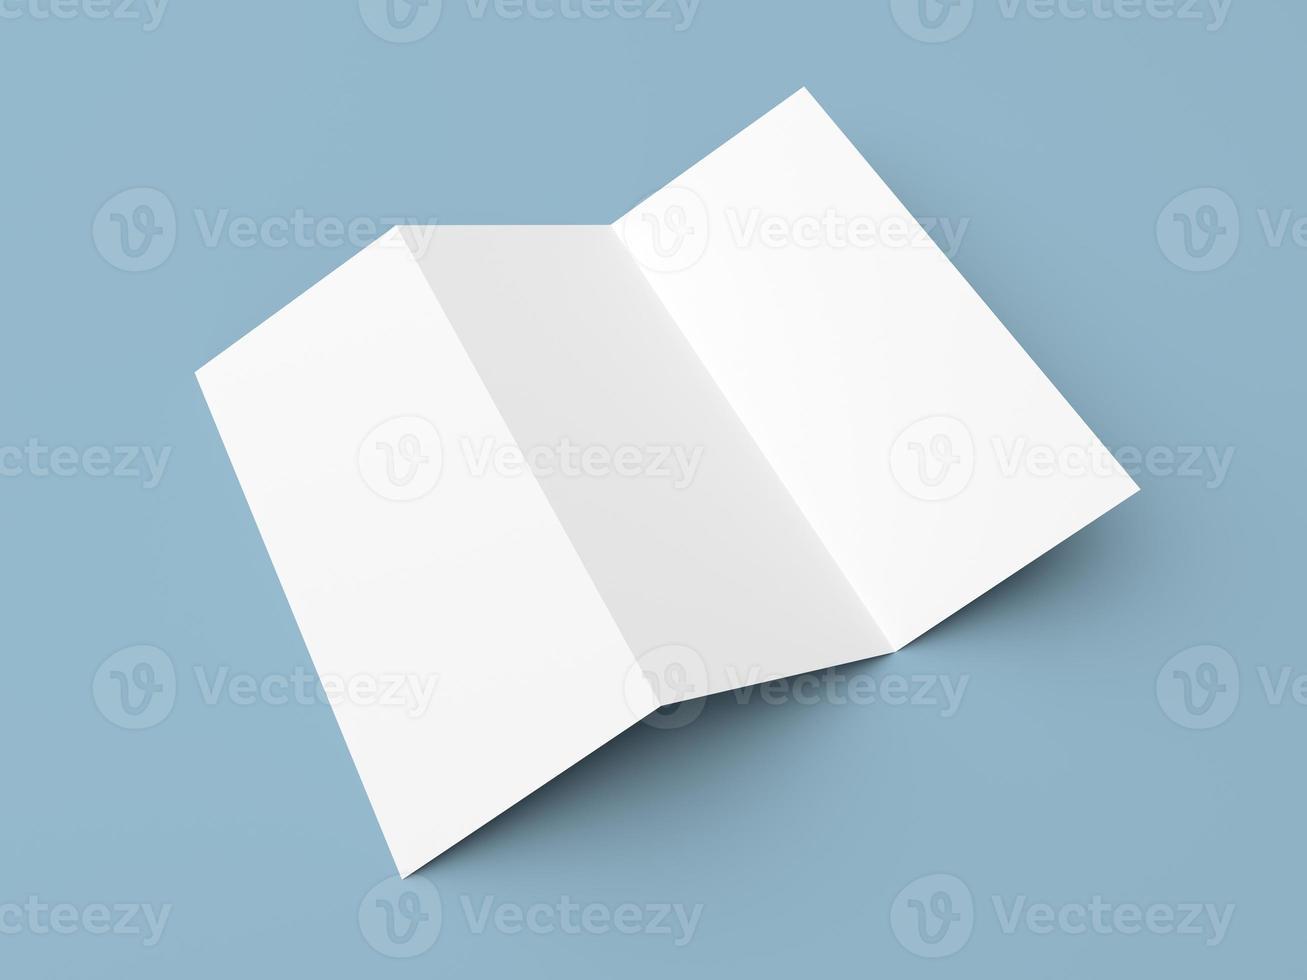 Leaflet blank tri-fold white paper brochure photo